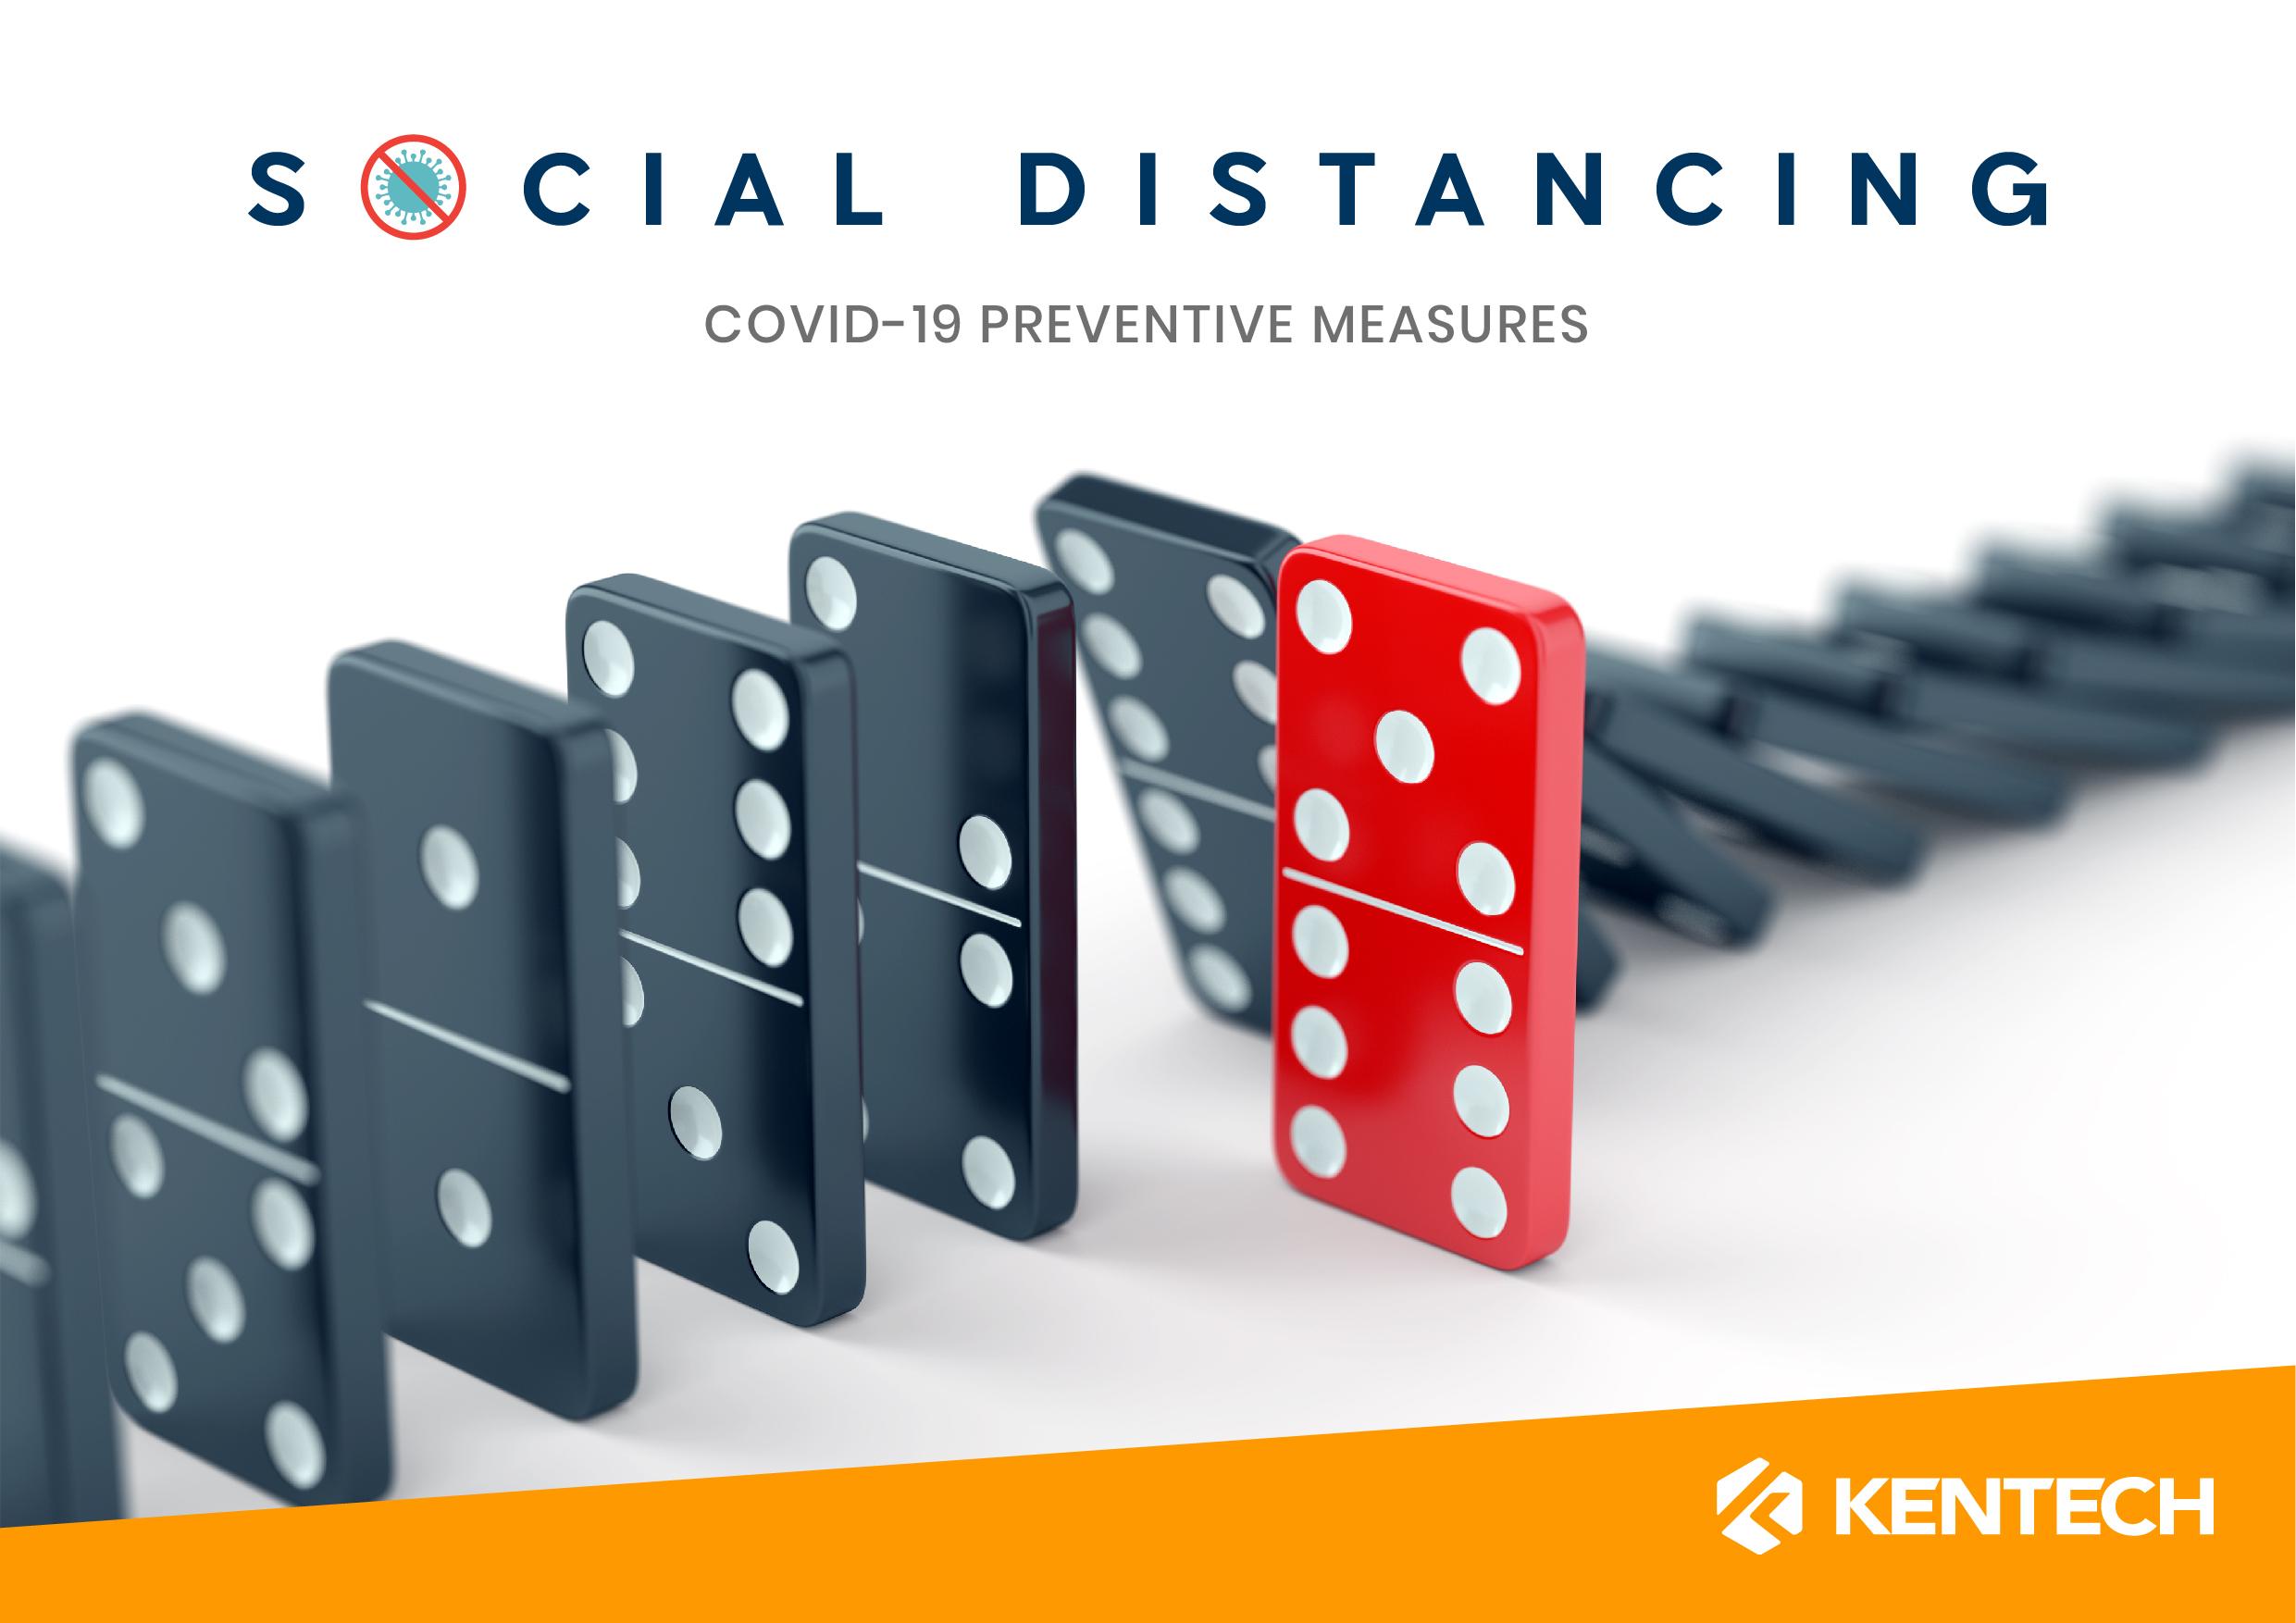 Kentech_Covid-19_SocialDistance-03-01